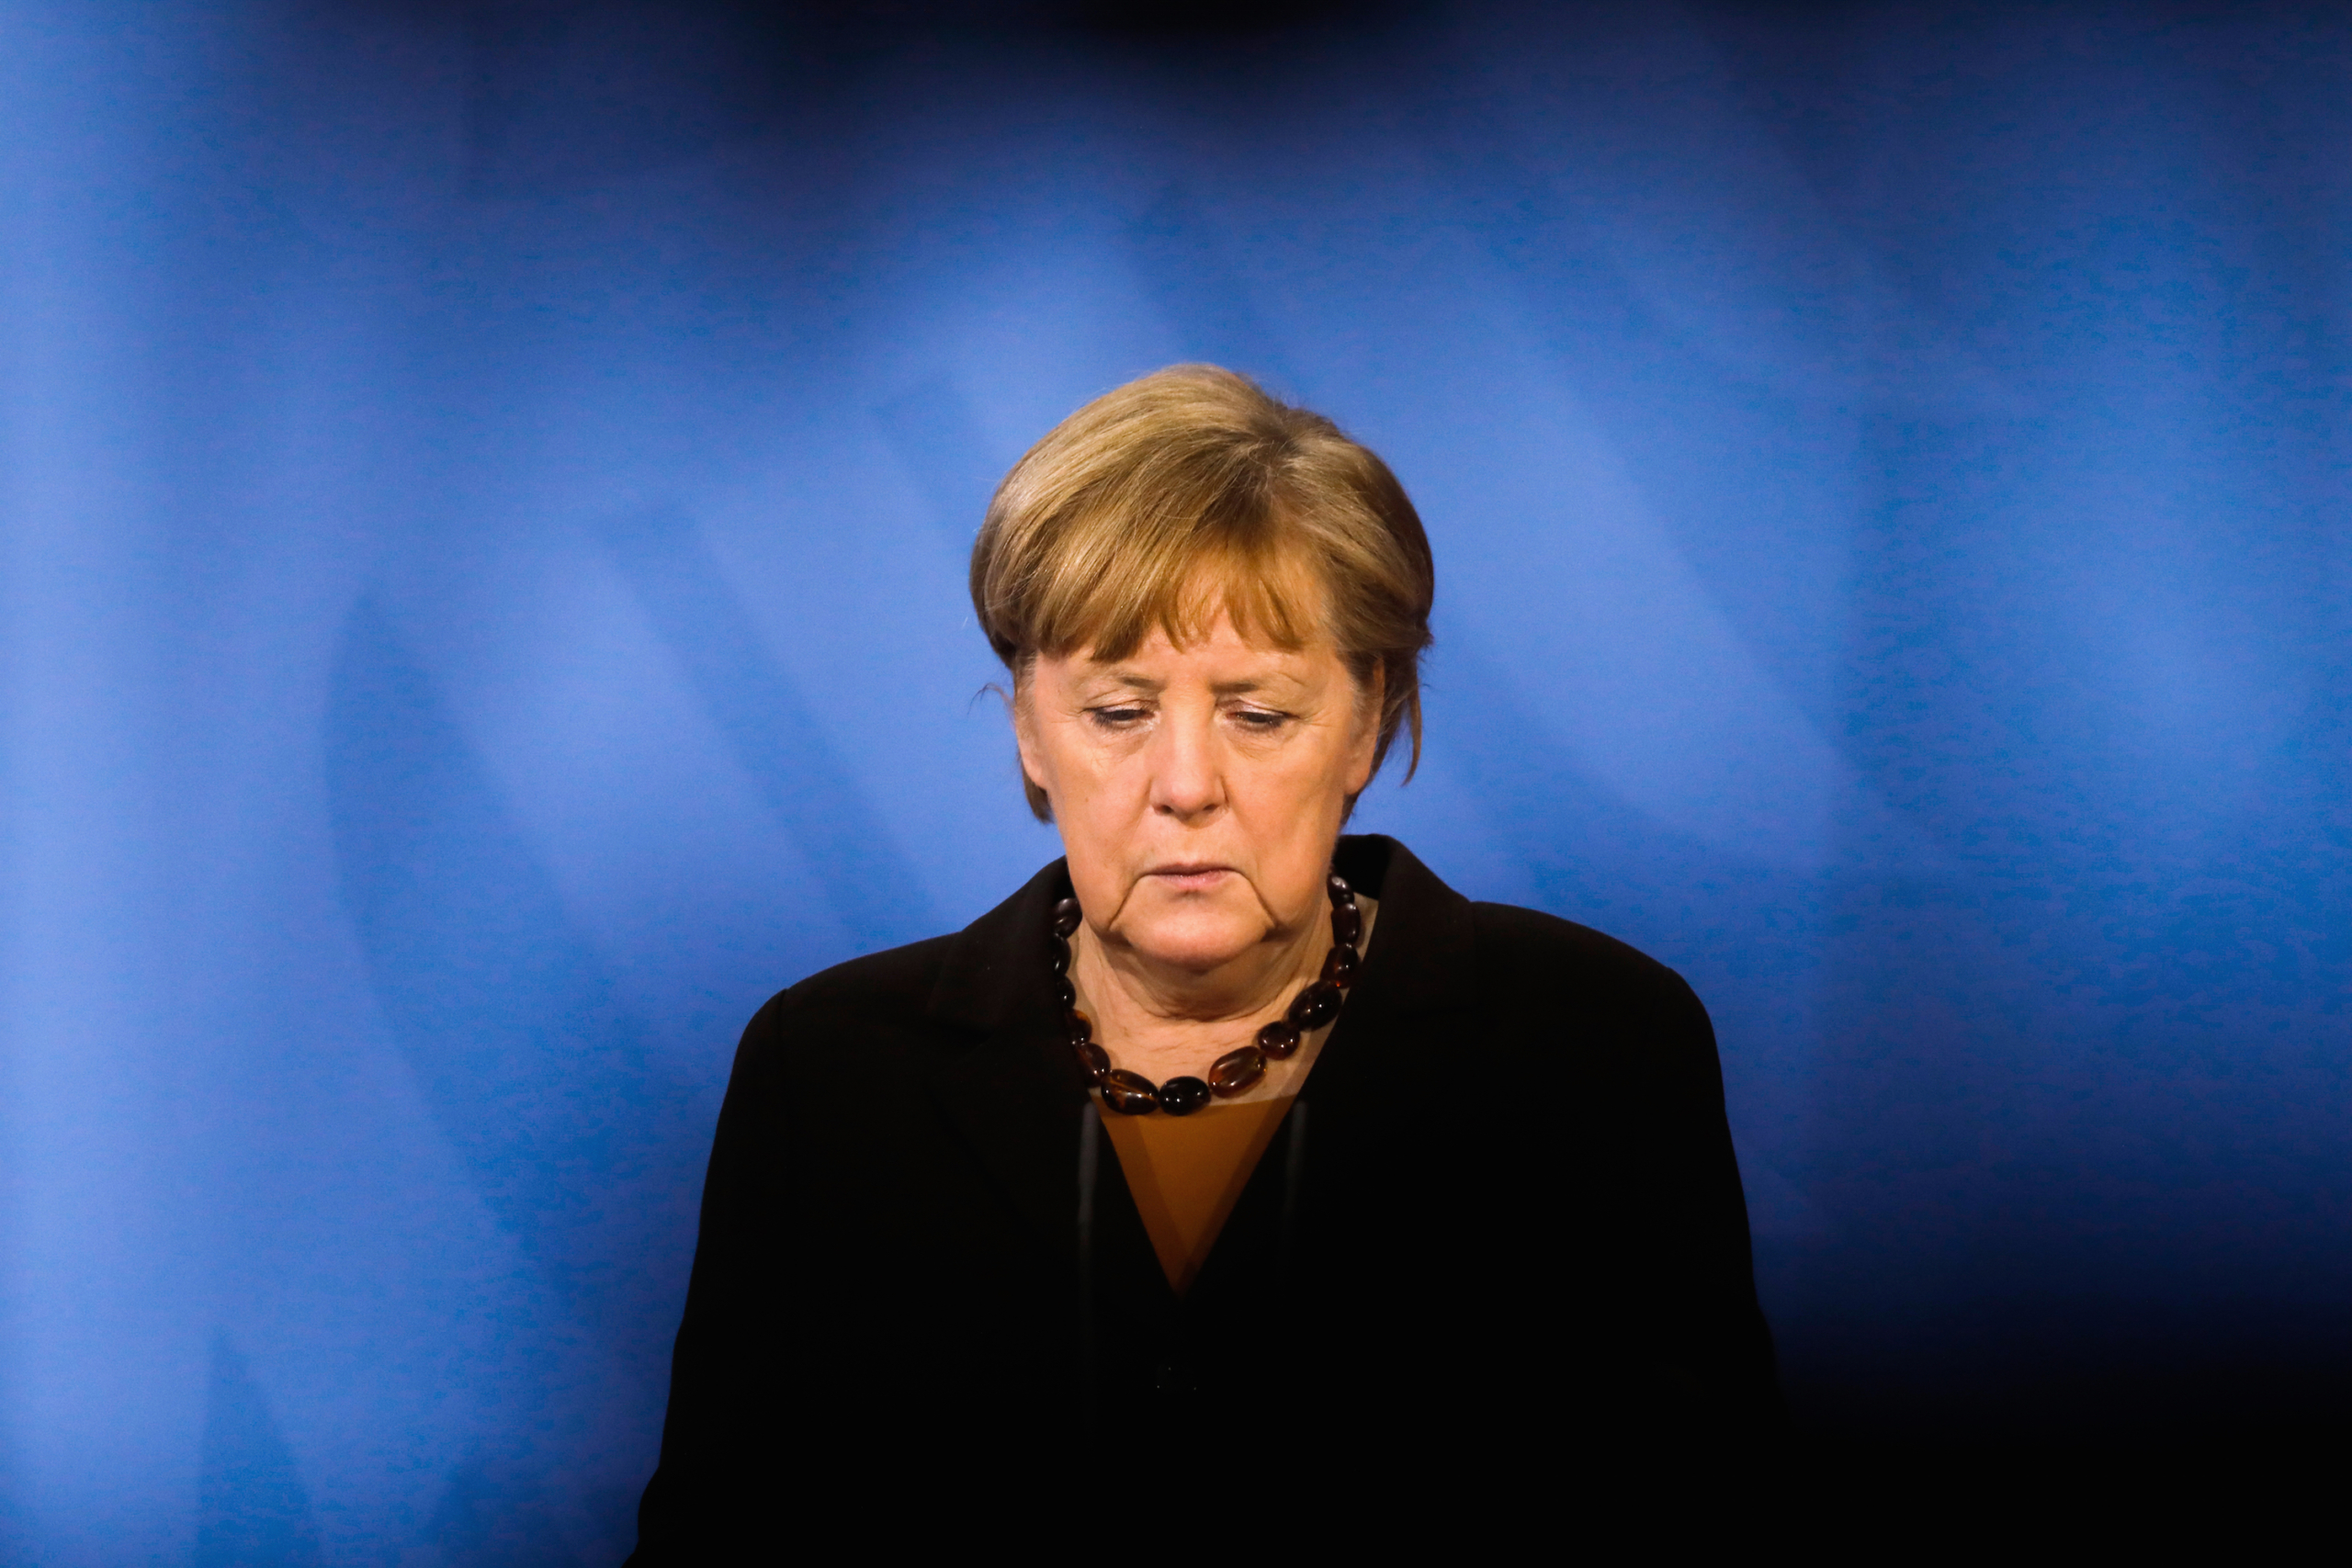 Angela Merkel / EP